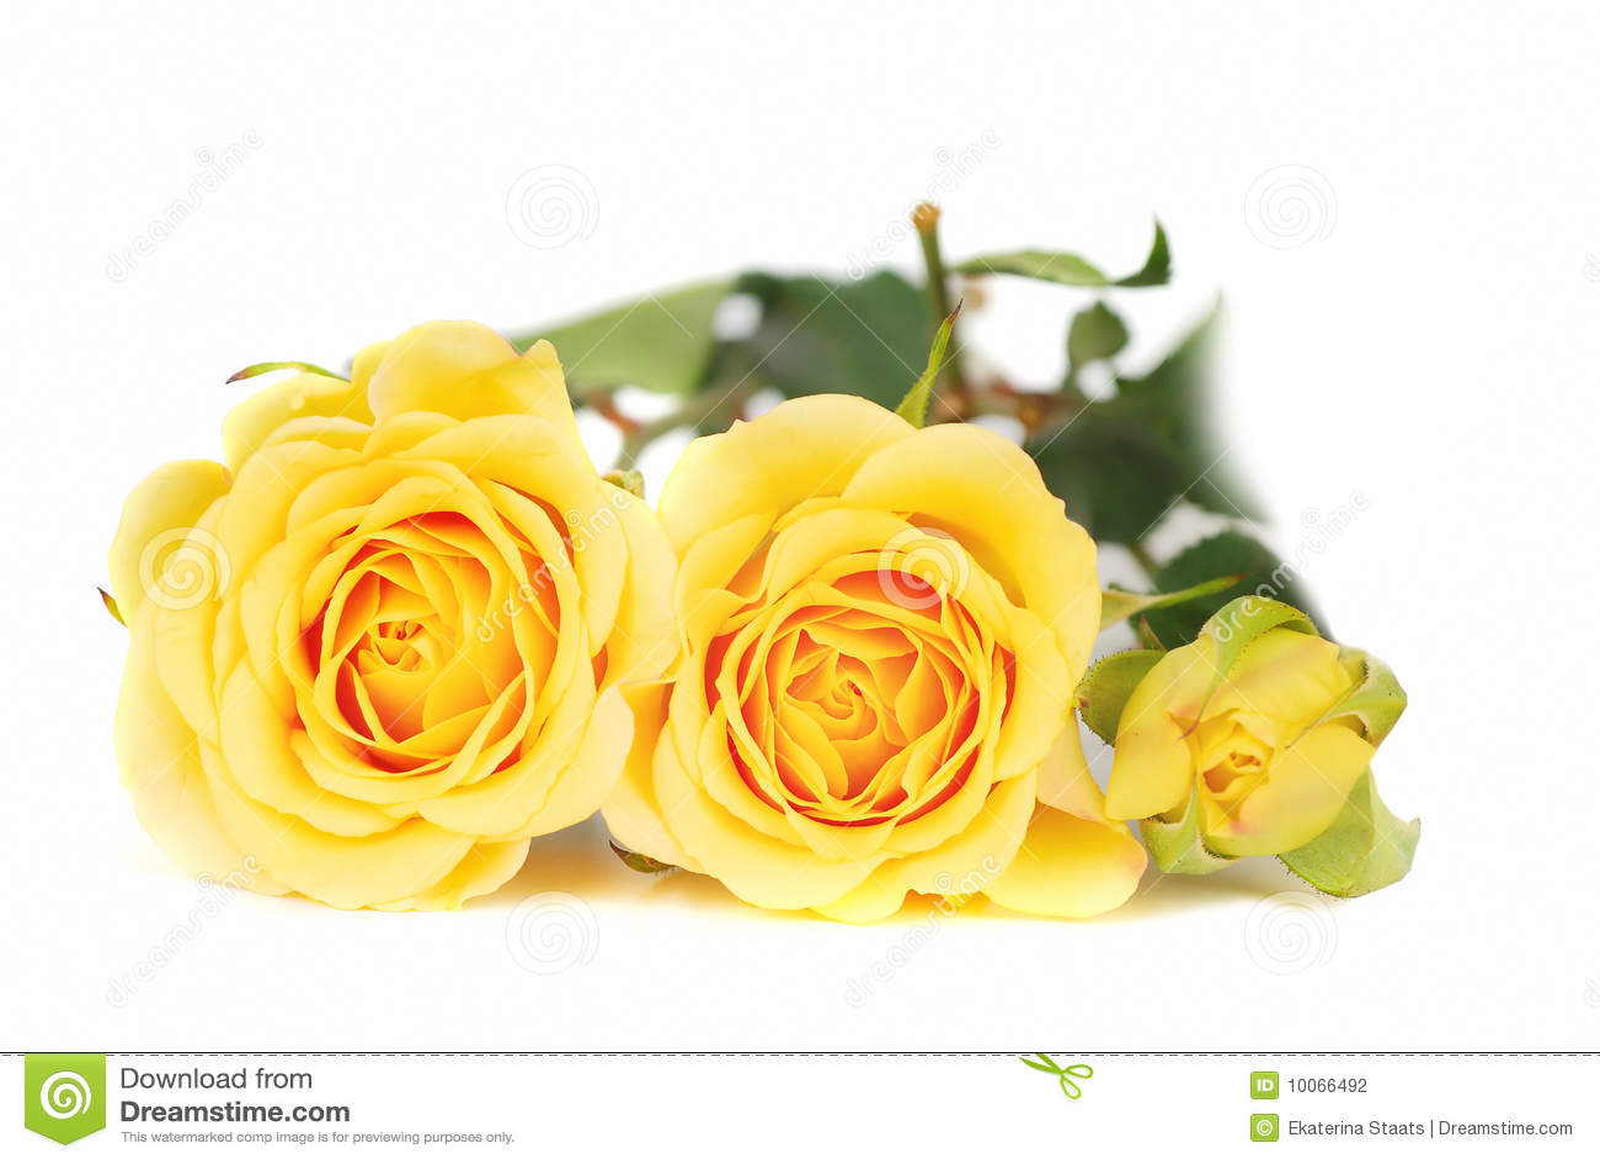 Rosas amarelas.